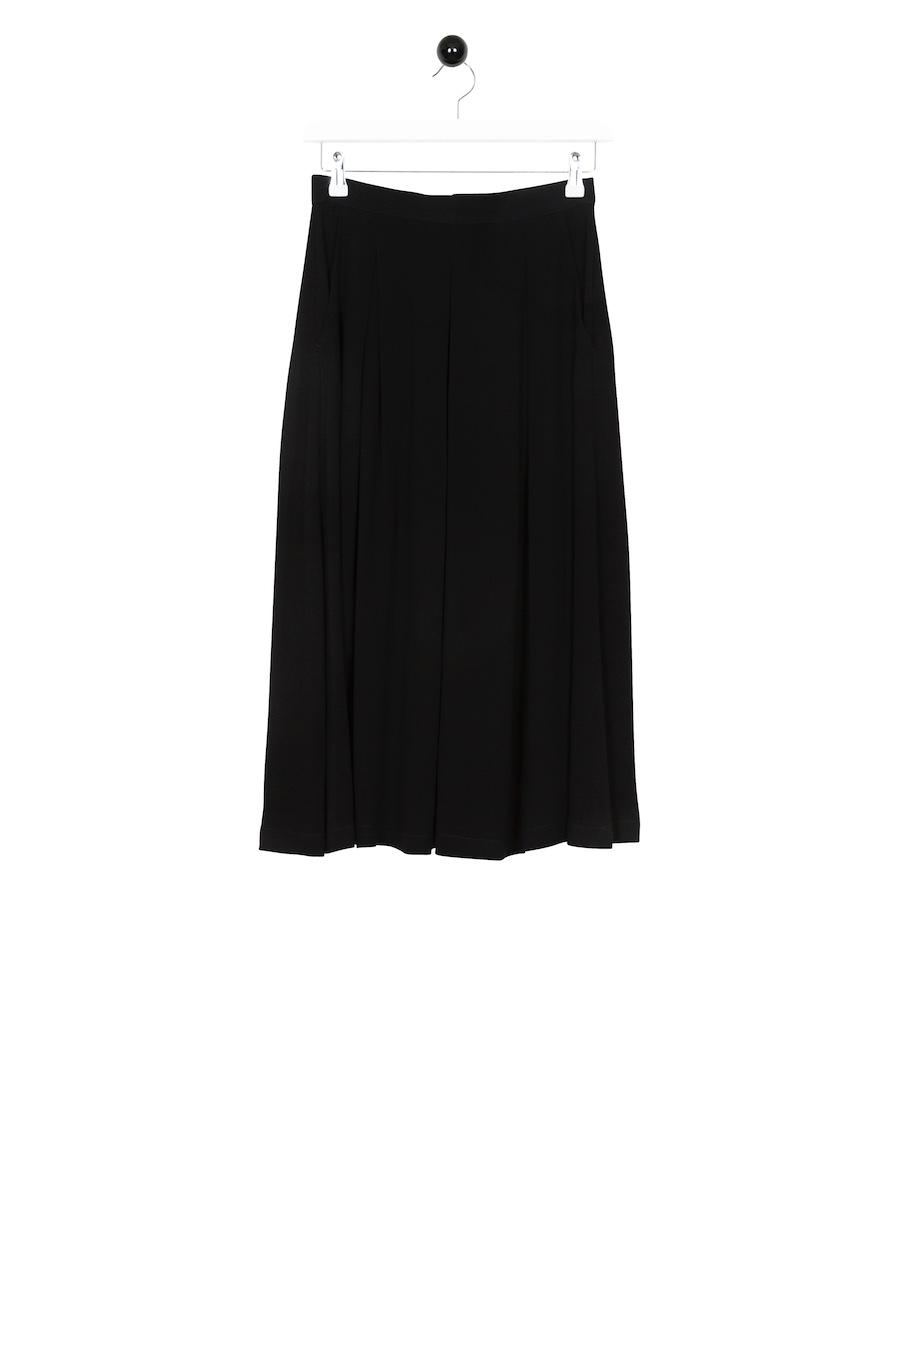 Ebenholts Skirt